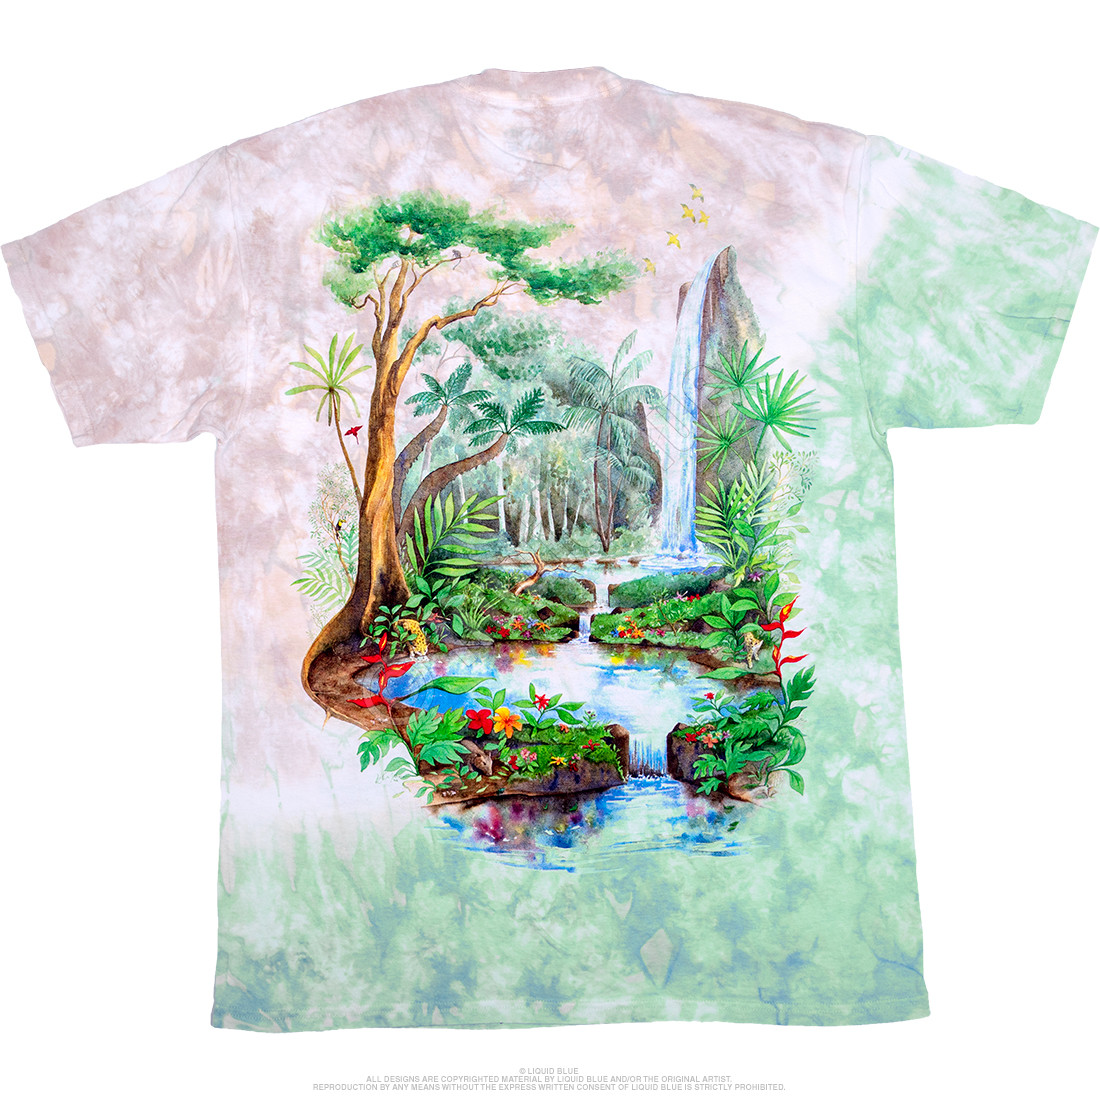 Rainforest Tie-Dye T-Shirt